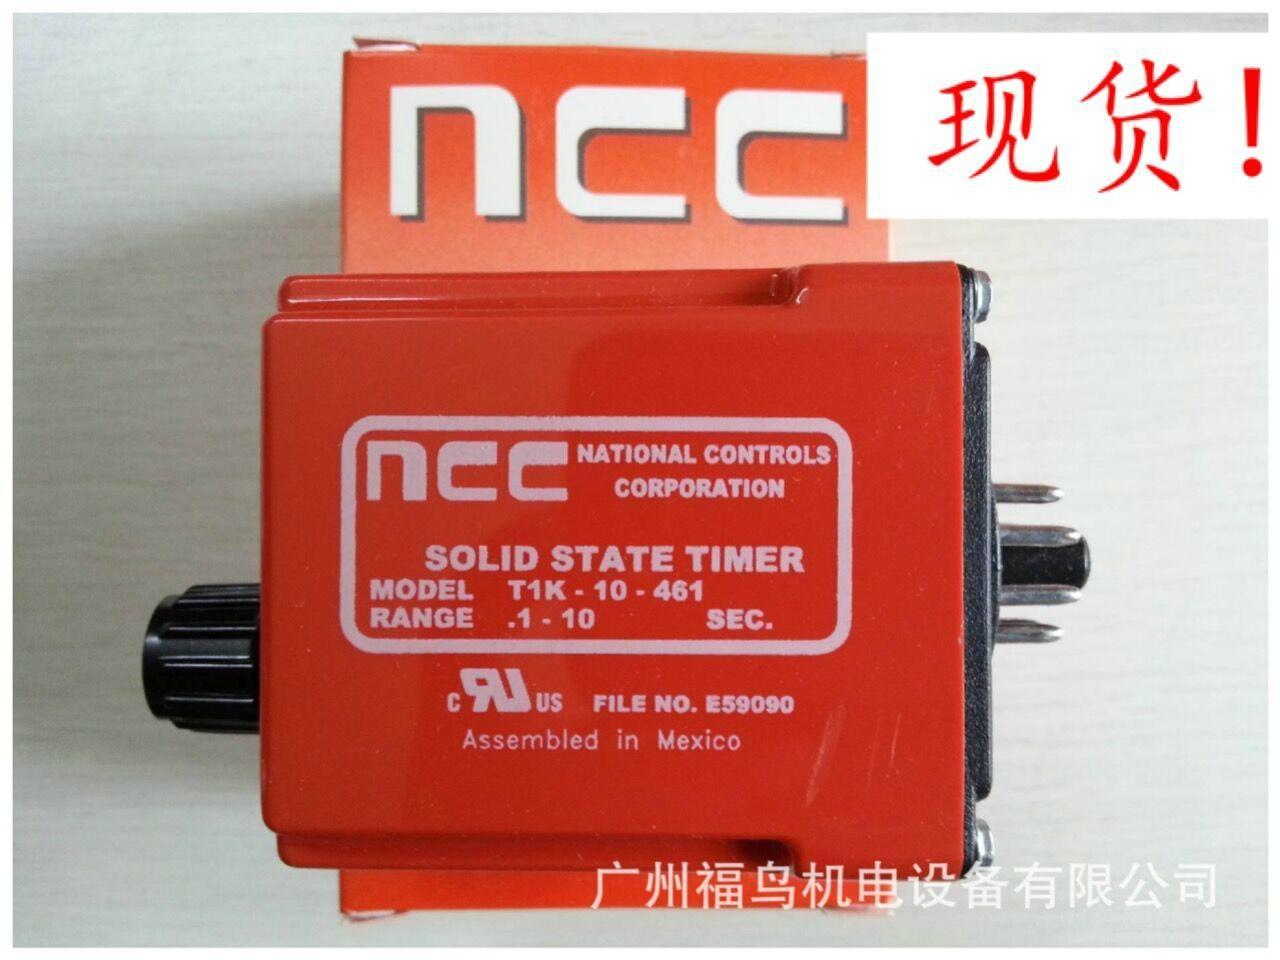 NCC延时继电器, 型号: T1K-10-461